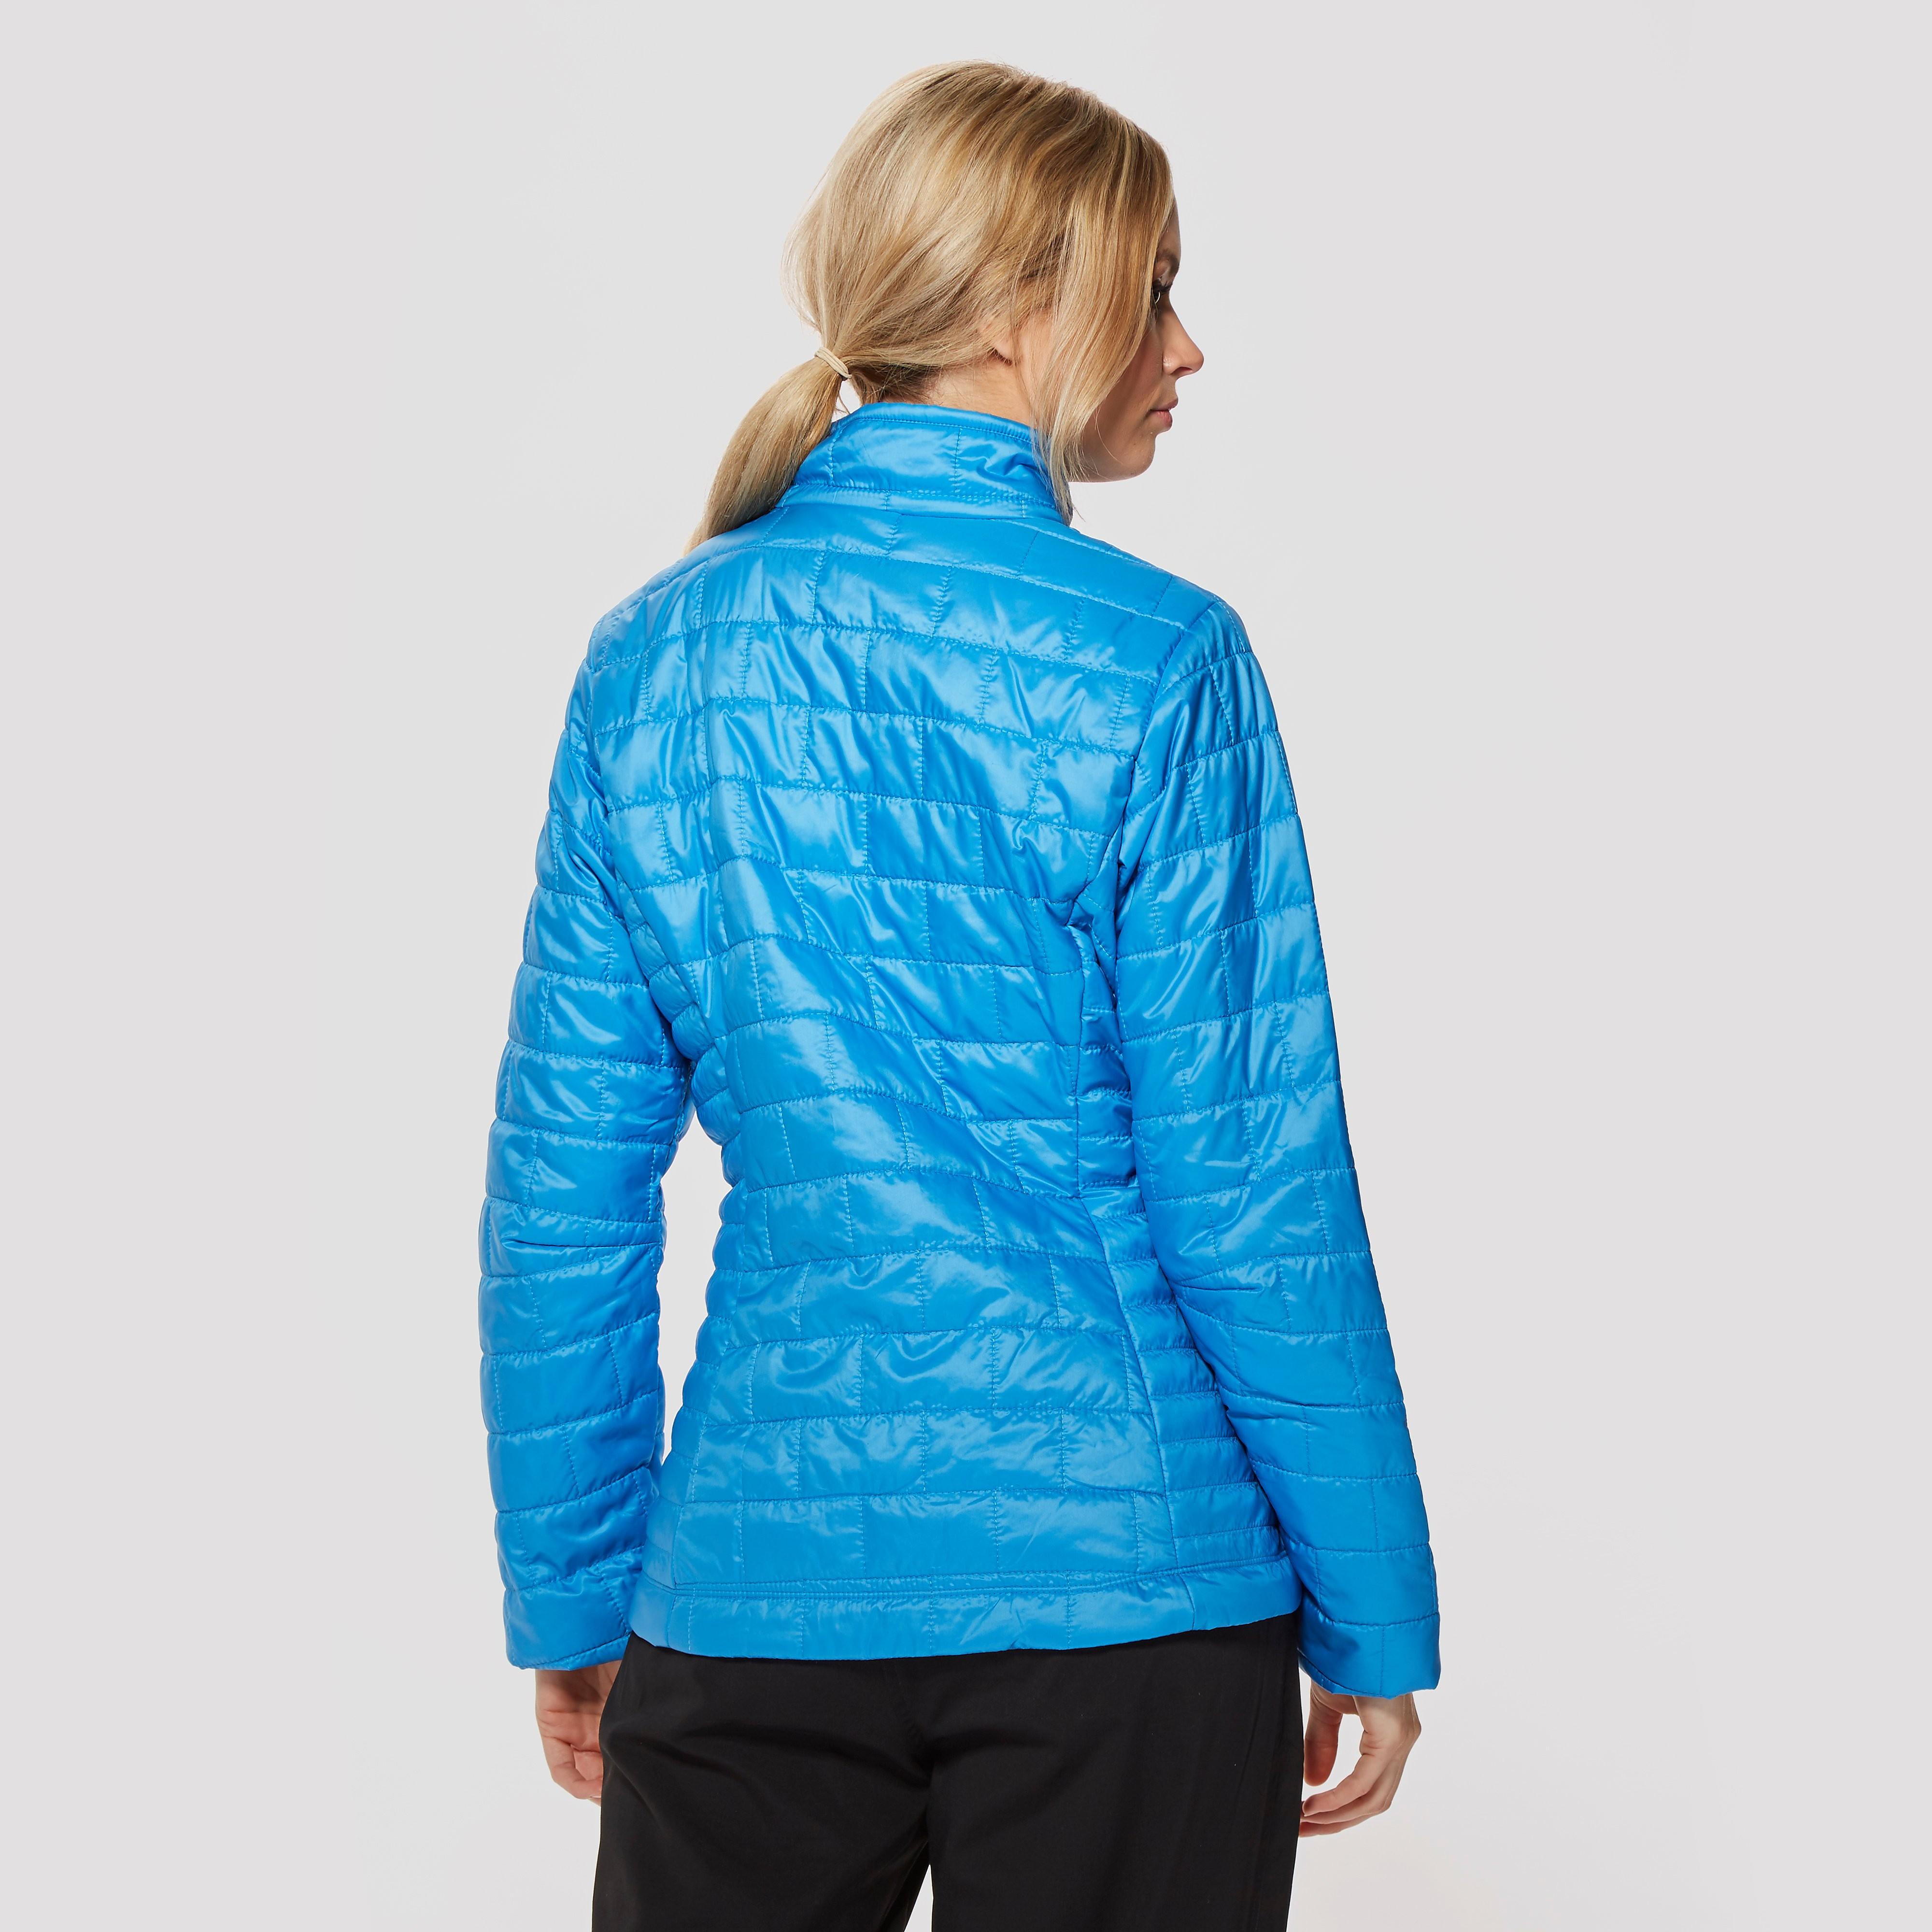 Patagonia Nano Puff Women's Jacket